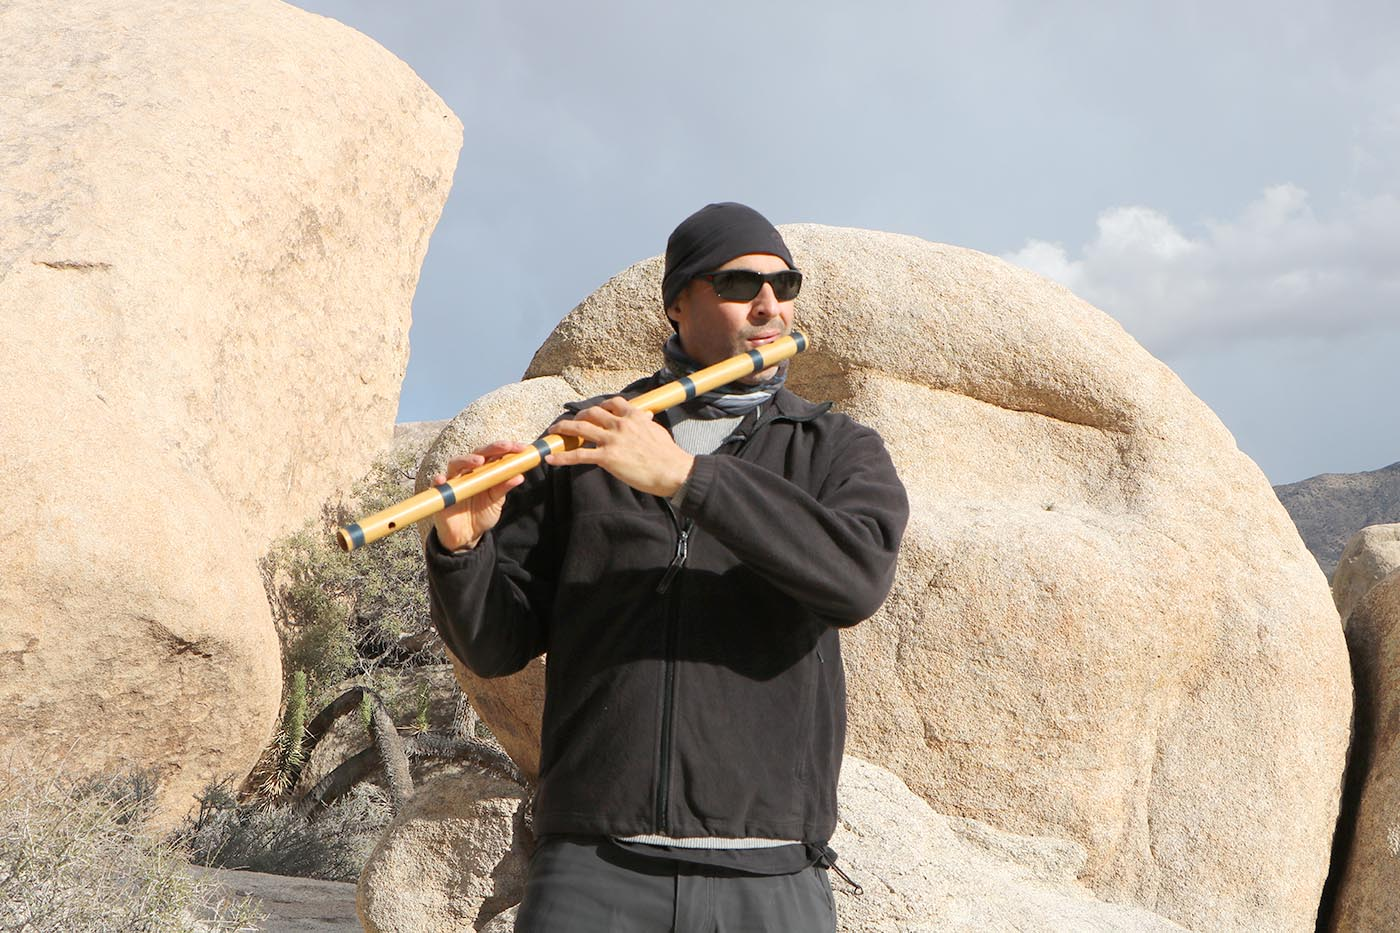 Flute Joshua Tree National Park Kerry Kriger Bansuri